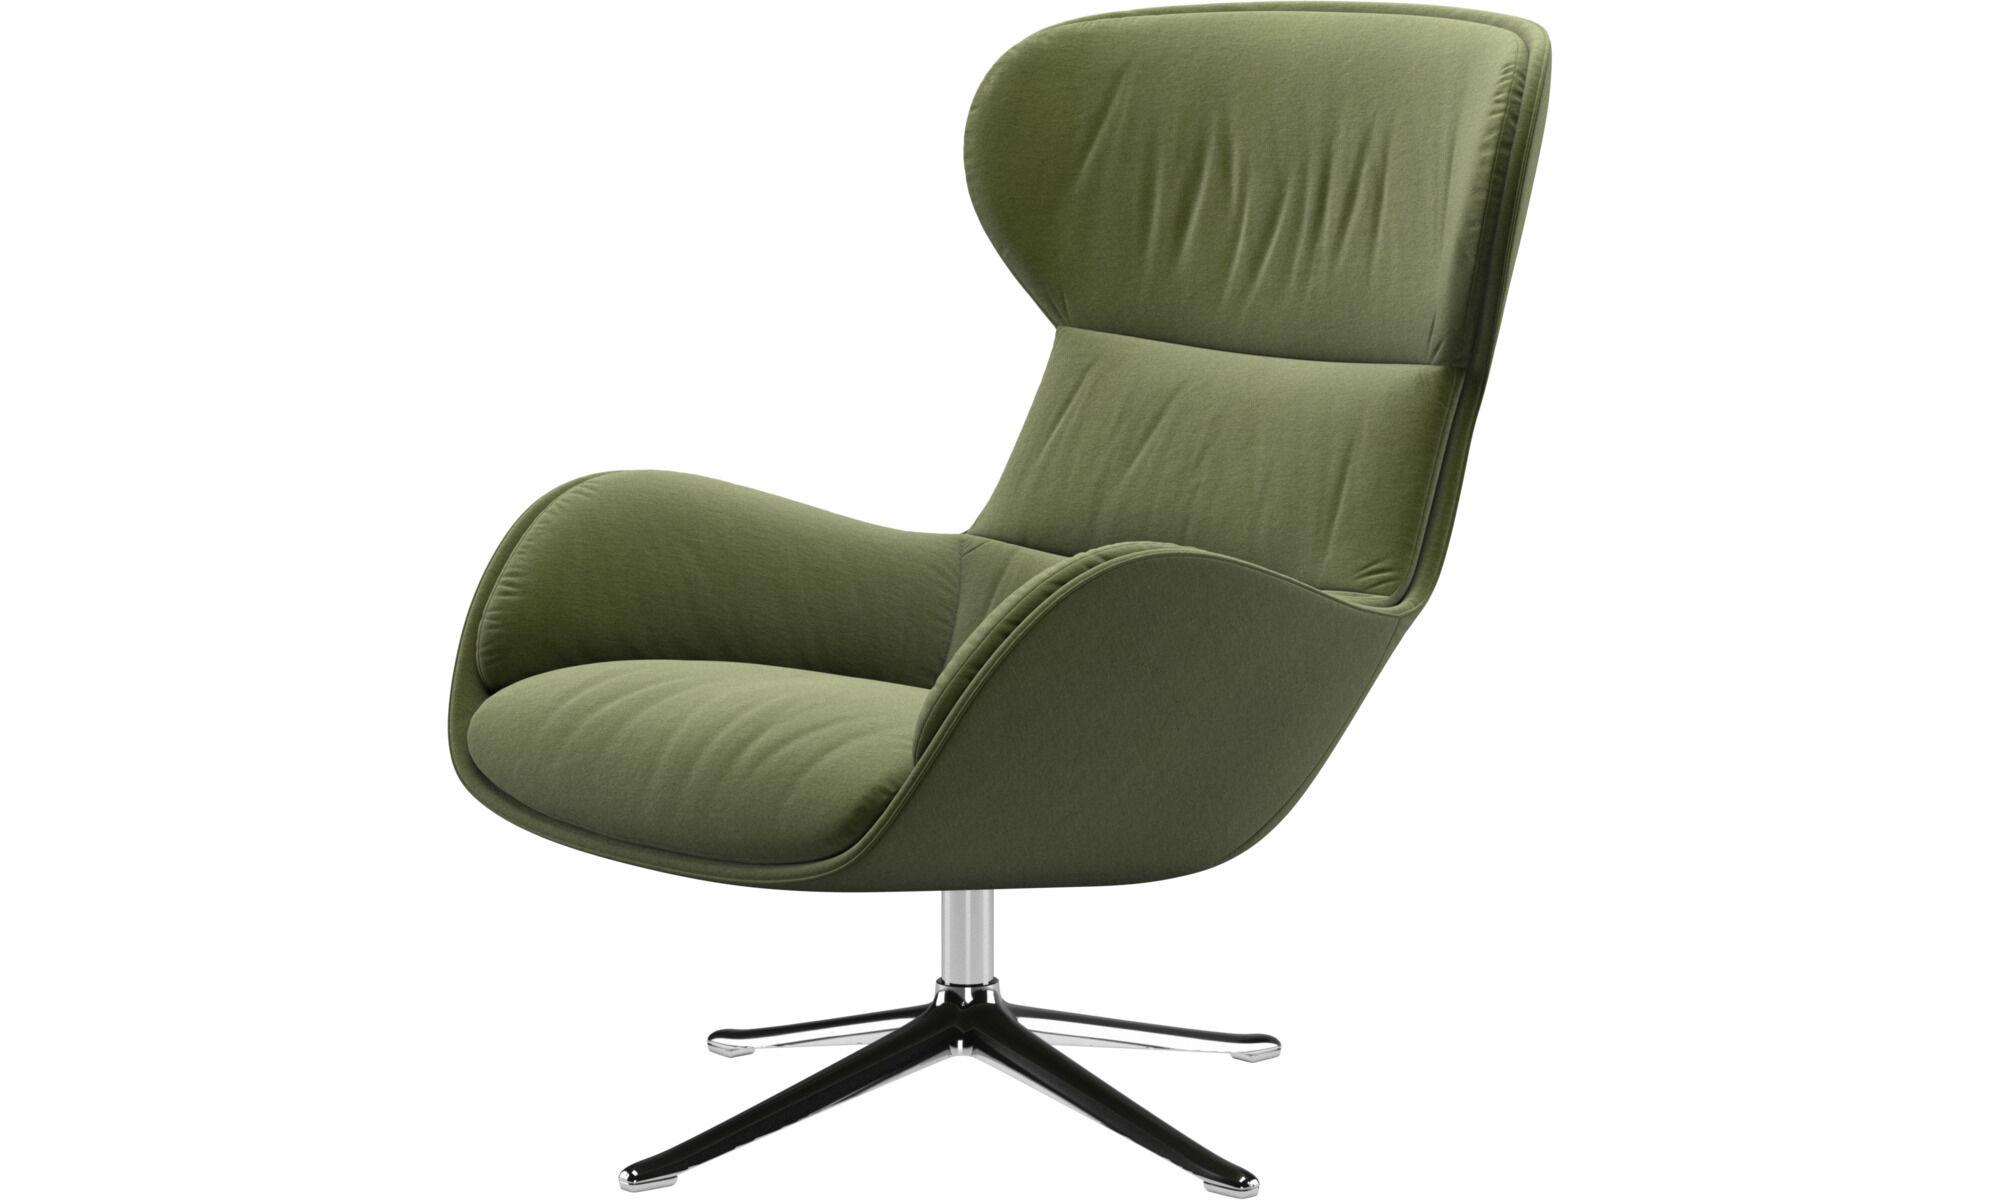 Reno living chair